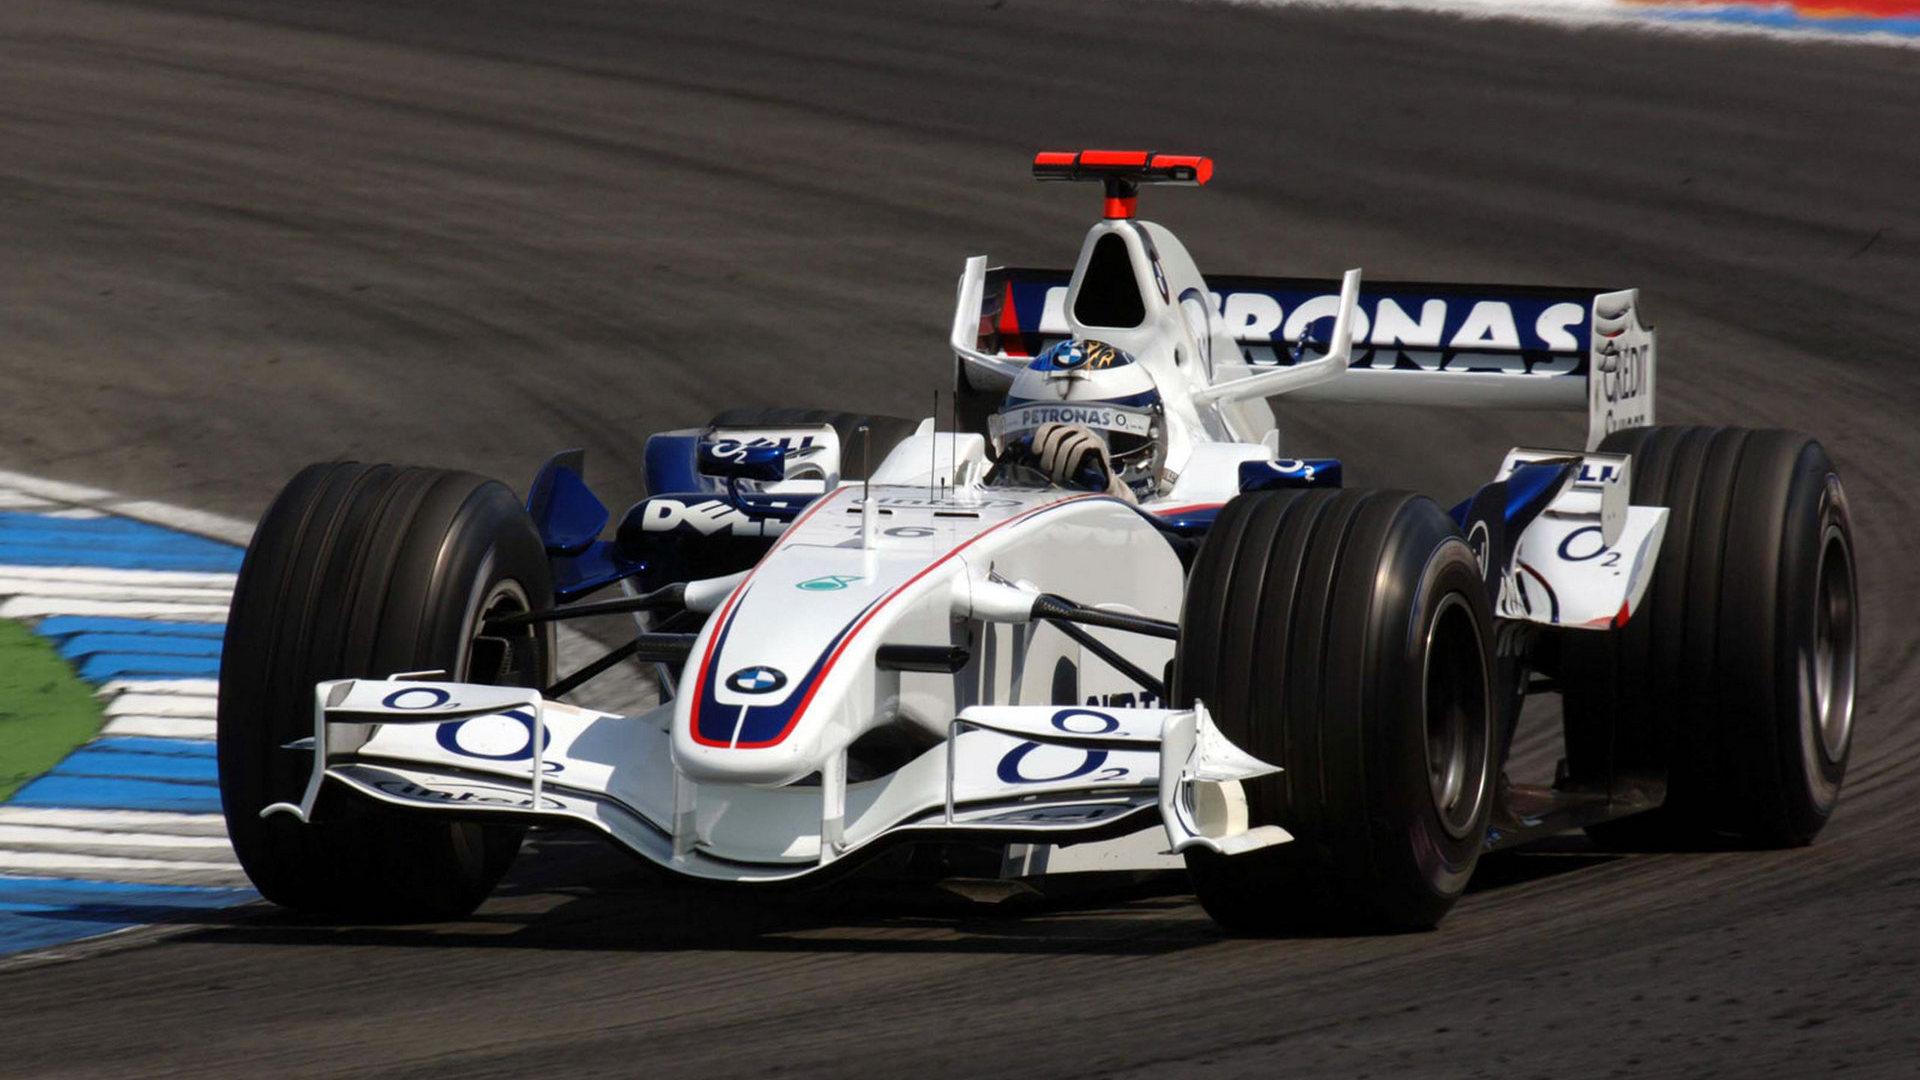 Bmw Sauber F1 Team Drivers Wiki Cars Stats Facts Profile